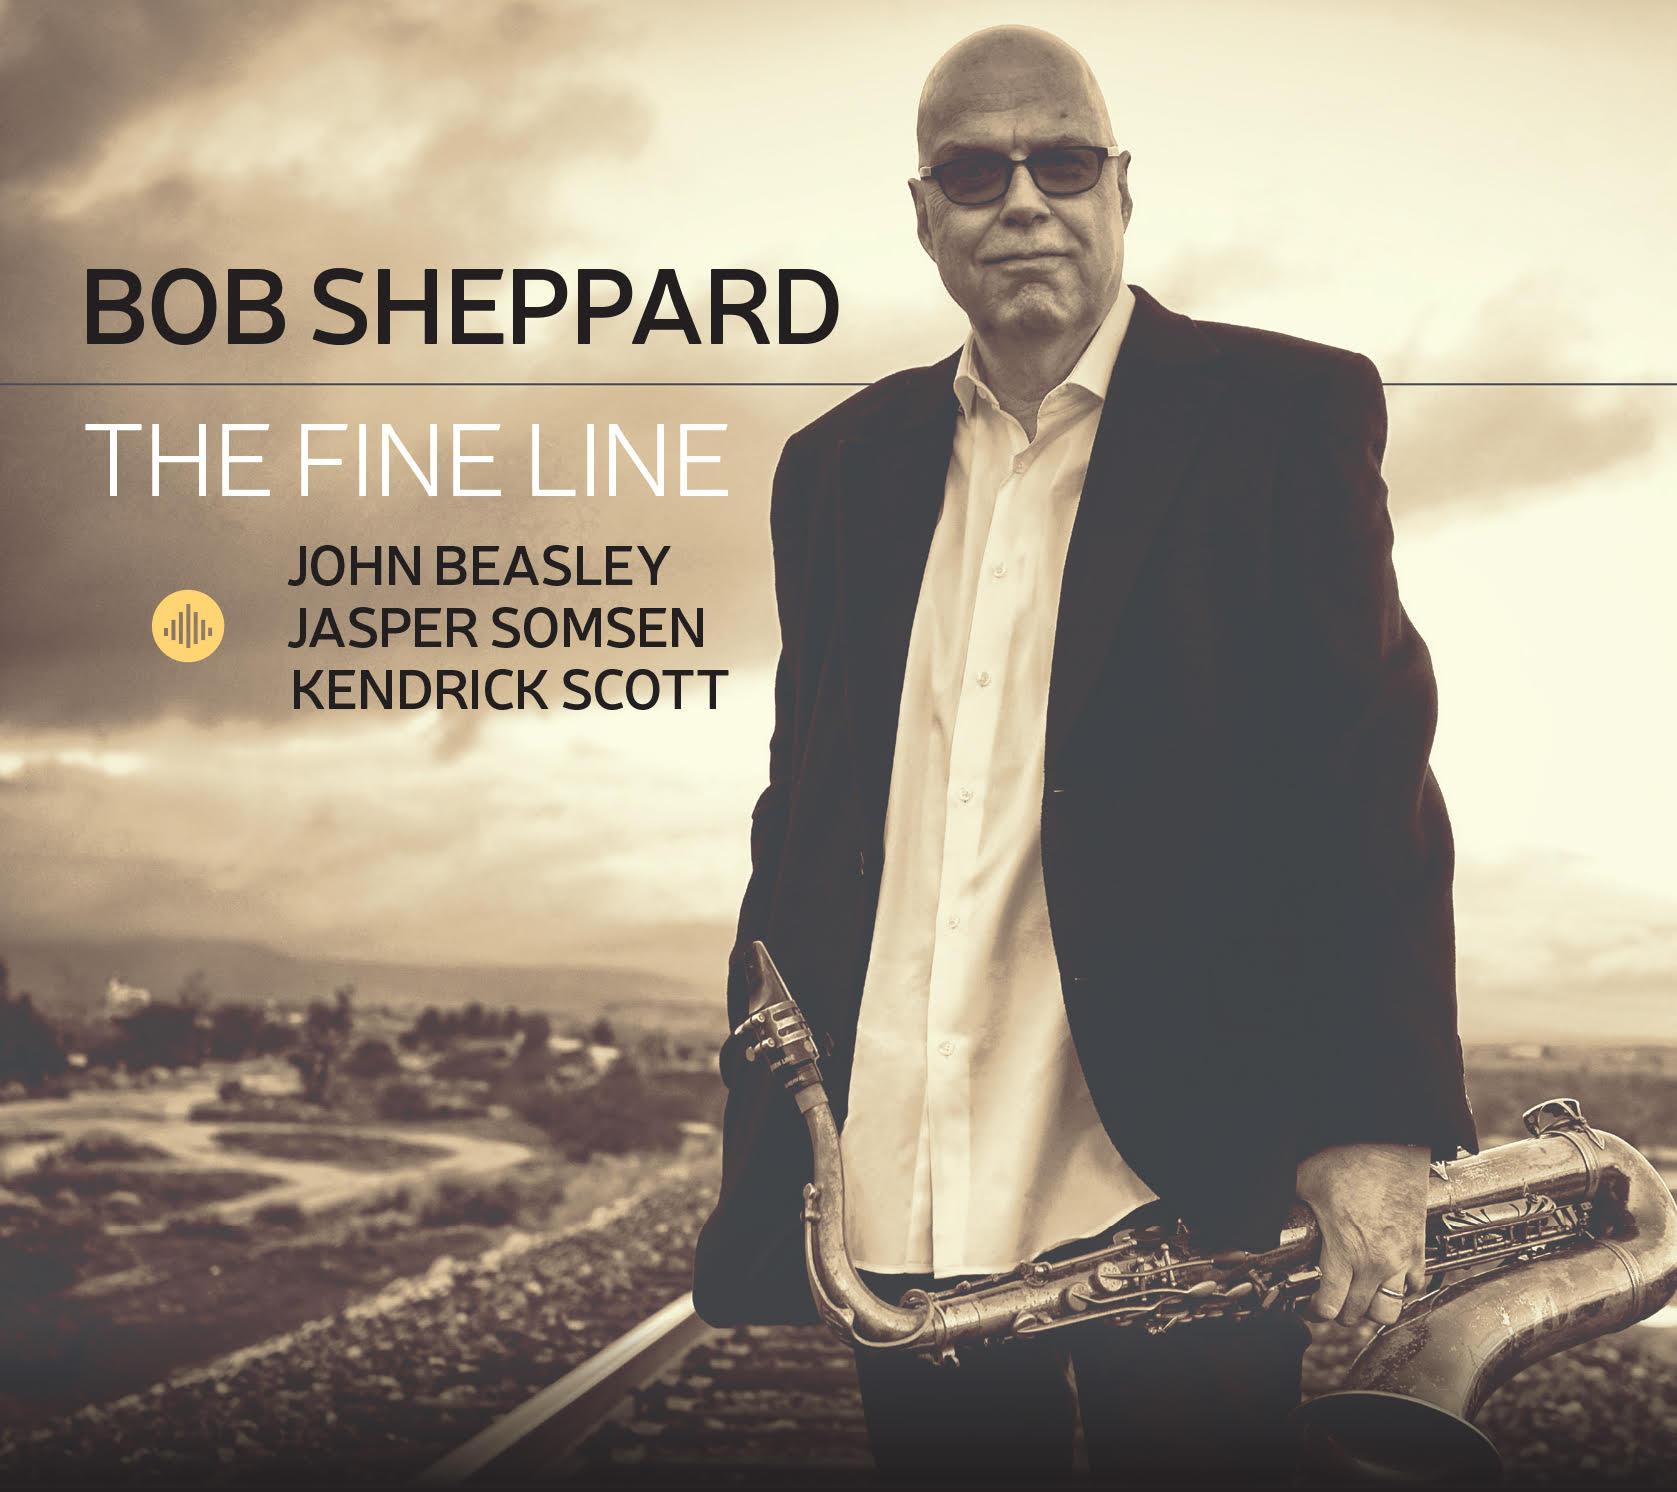 The Fine Line - Bob Sheppard - SaxophoneJohn Beasley- KeyboardsJasper Somsen - Bass Kendrick Scott - Drums Mike Cottone - Trumpet (2)Simon Moullier - Vibraphone (1,6,8)Maria Puga Lareo - Vocals (3) Benjamin Shepherd - Electric Bass (2,4)Aaron Serfaty - Percussion (3,6)